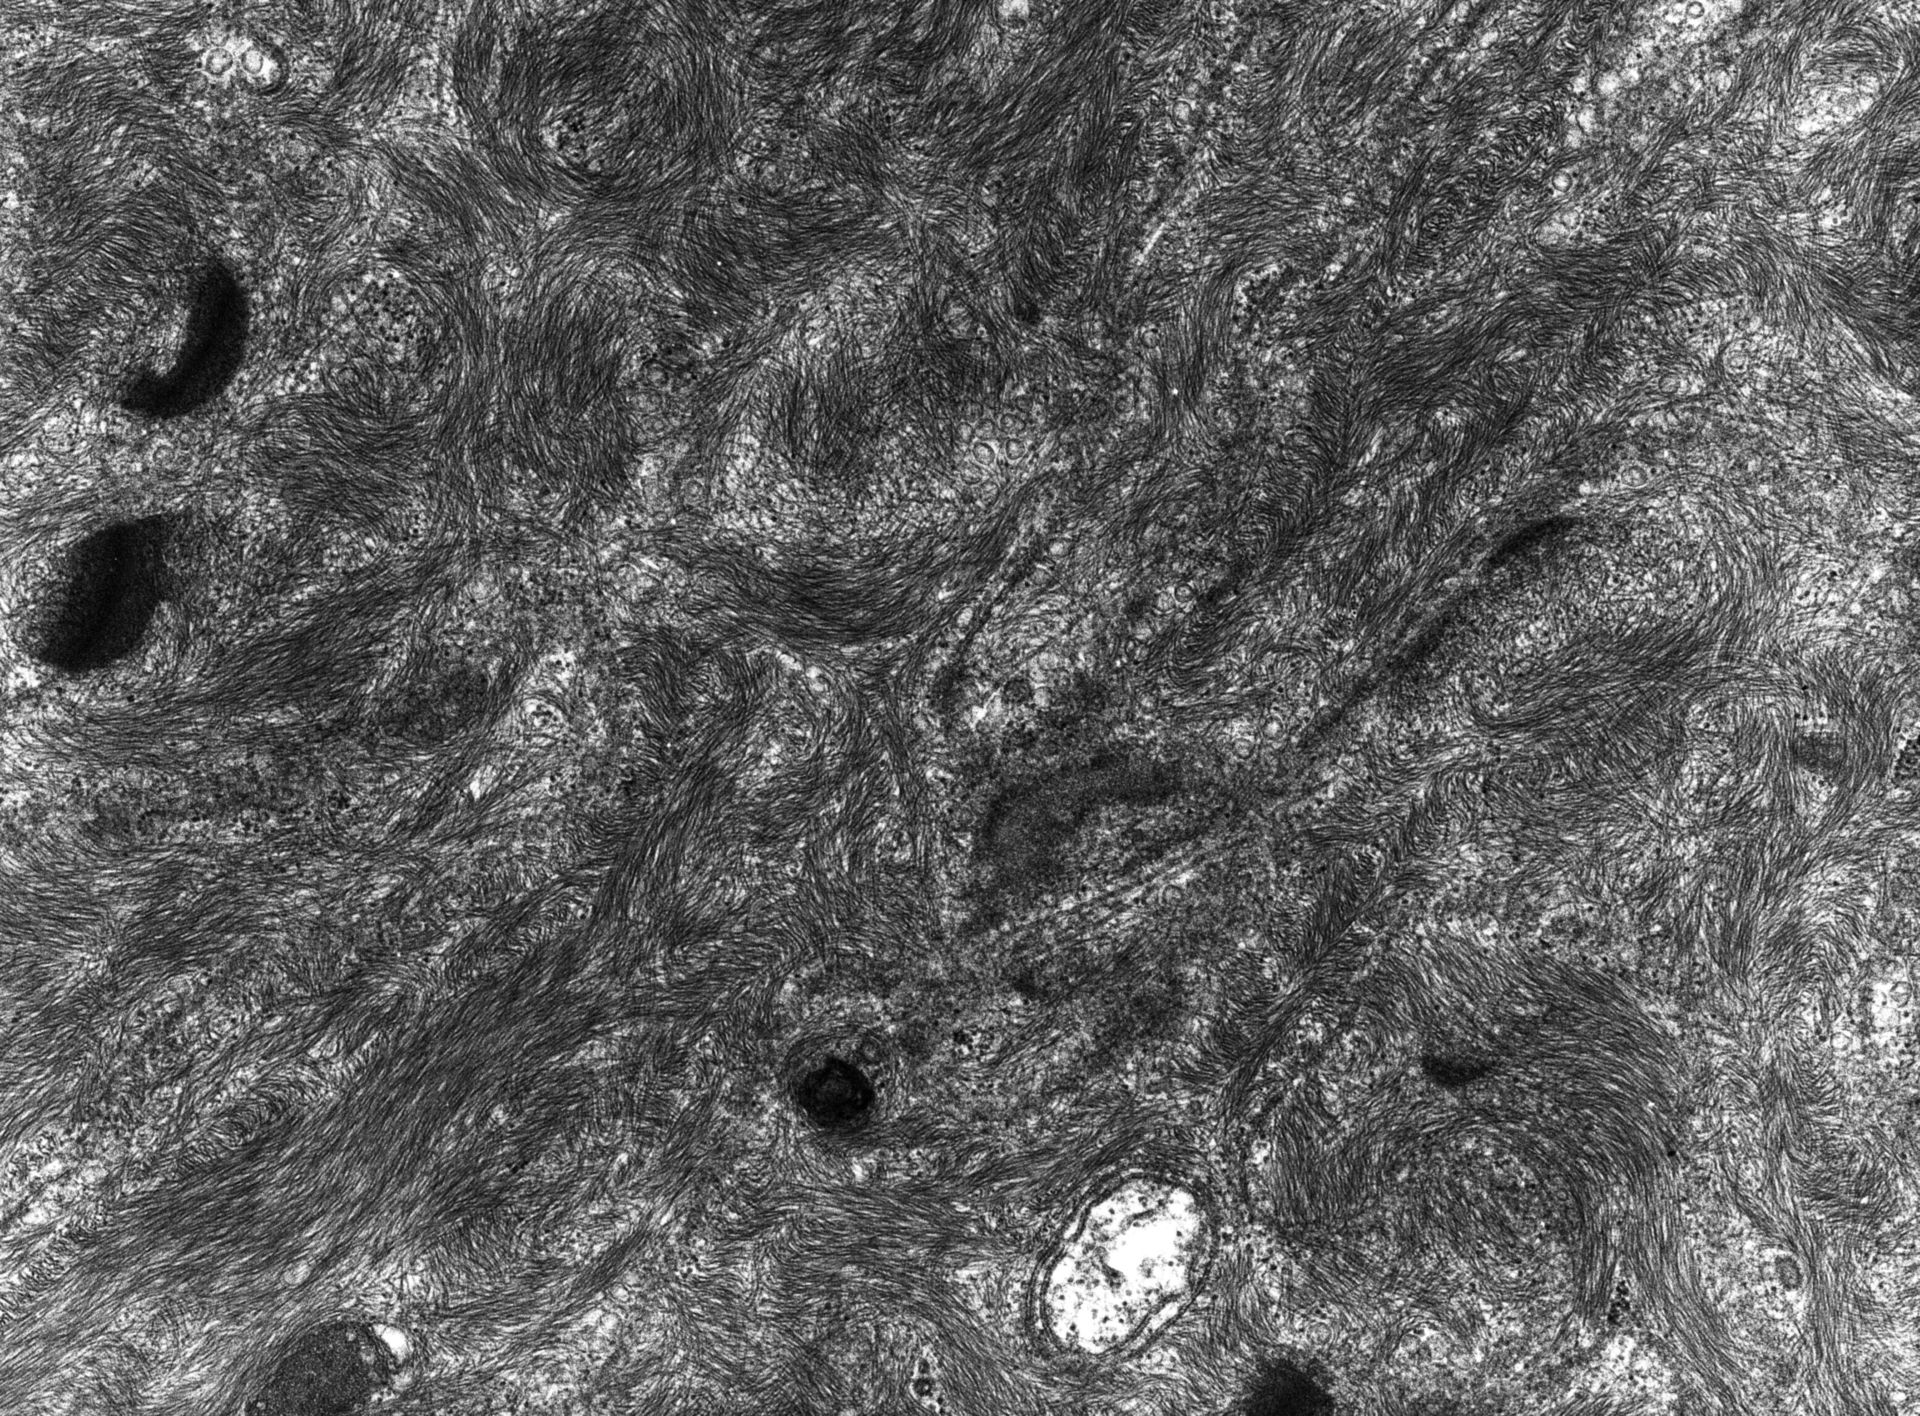 Rana catesbeiana (Plasma membrane) - CIL:10441